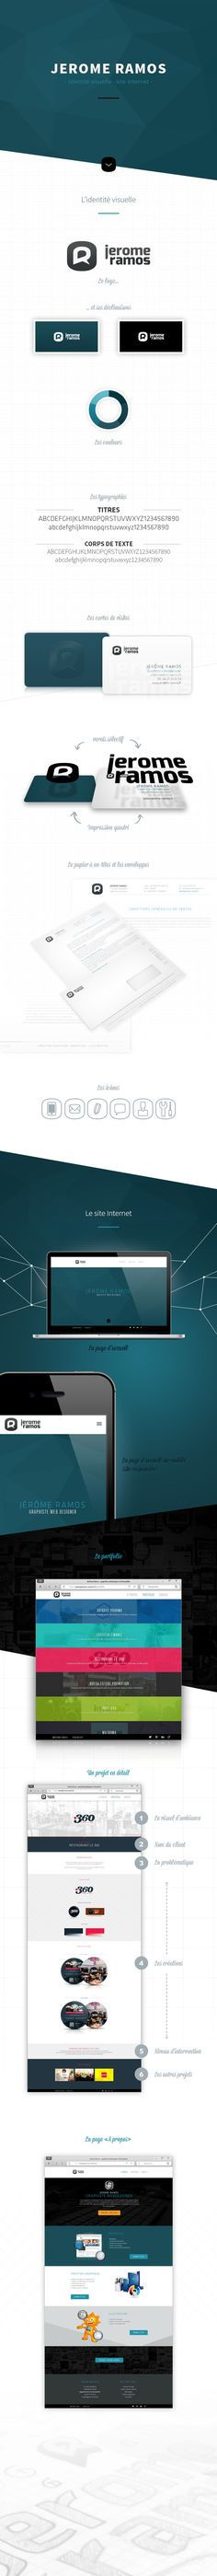 Le Site, Site Internet, Bar Chart, Corporate Design